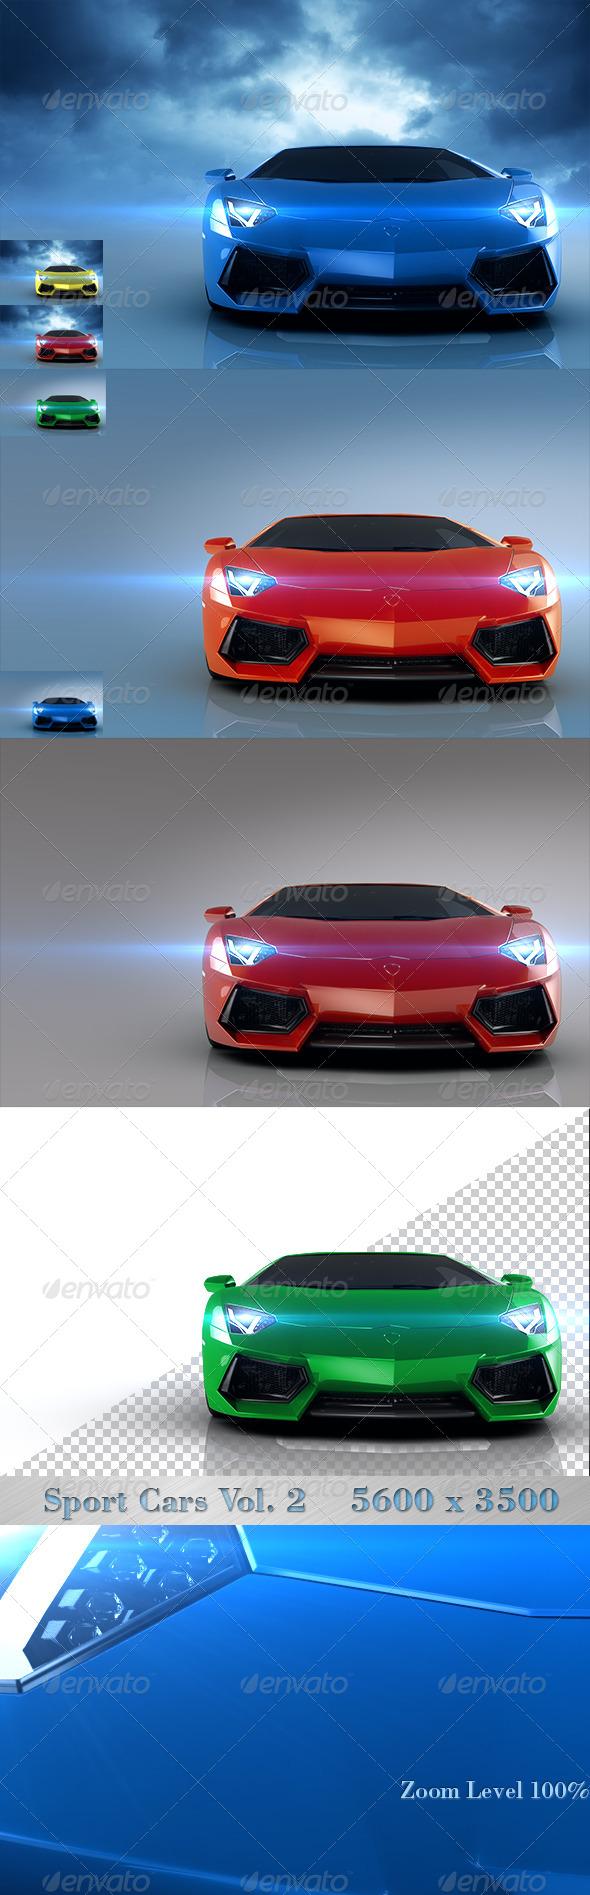 Sport Cars Vol. 2 - Objects 3D Renders